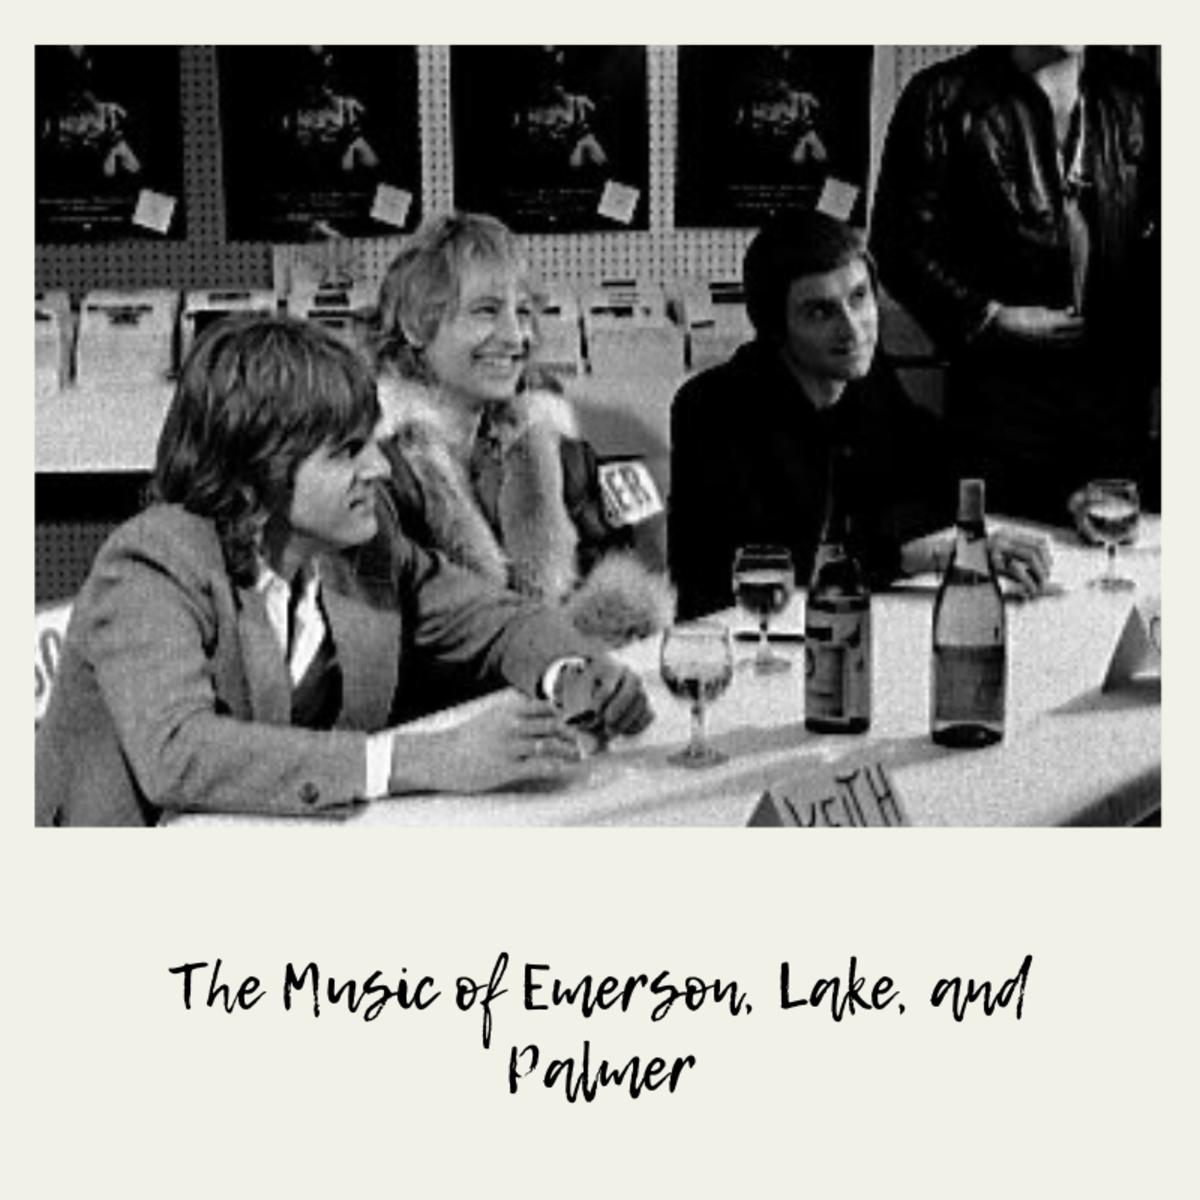 Emerson, Lake, and Palmer at Records on Wheels, Toronto, Feb. 2 or 3, 1978.